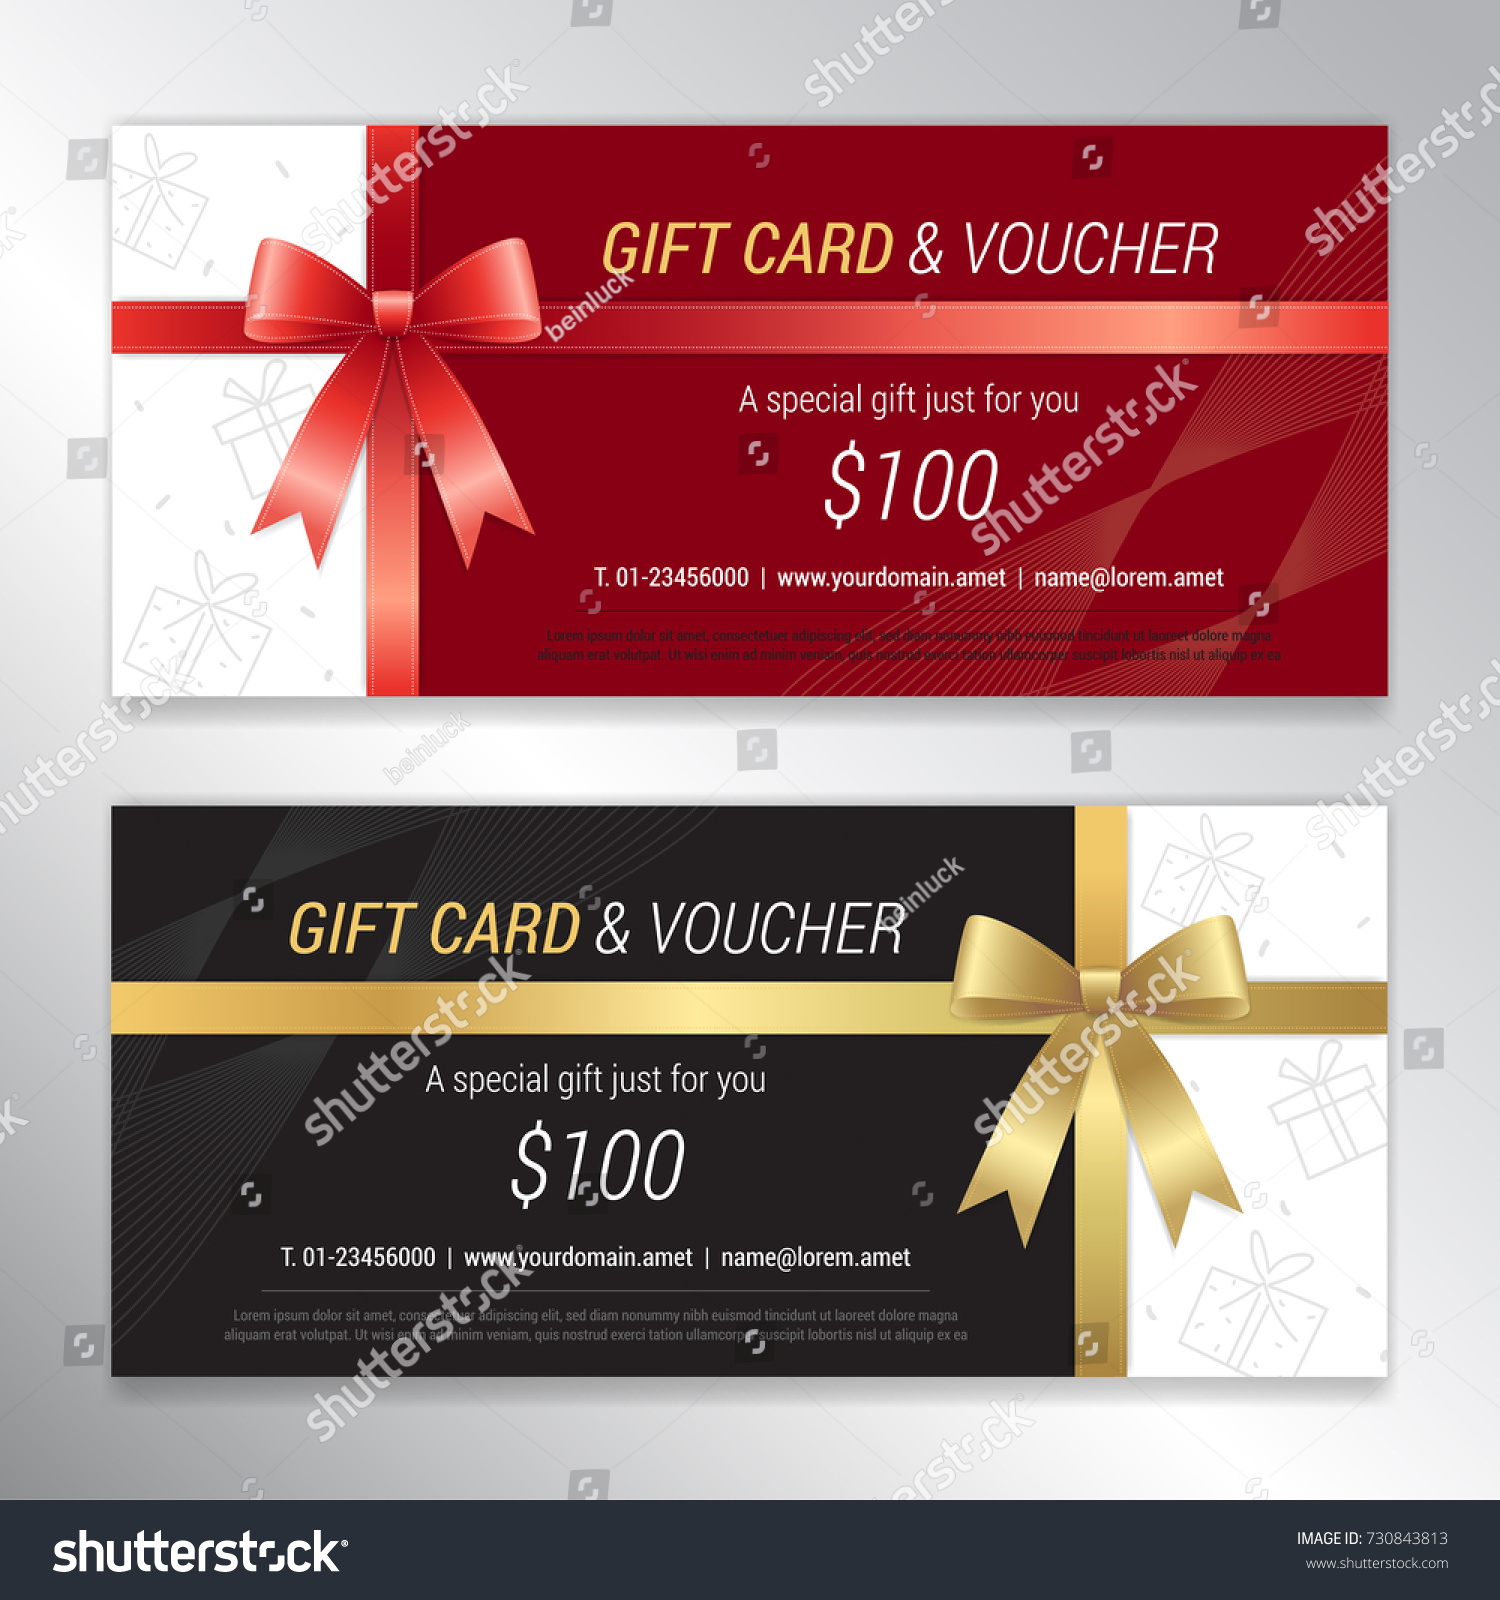 Gift voucher certificate discount card template stock vector gift voucher certificate discount card template stock vector 730843813 shutterstock yadclub Images